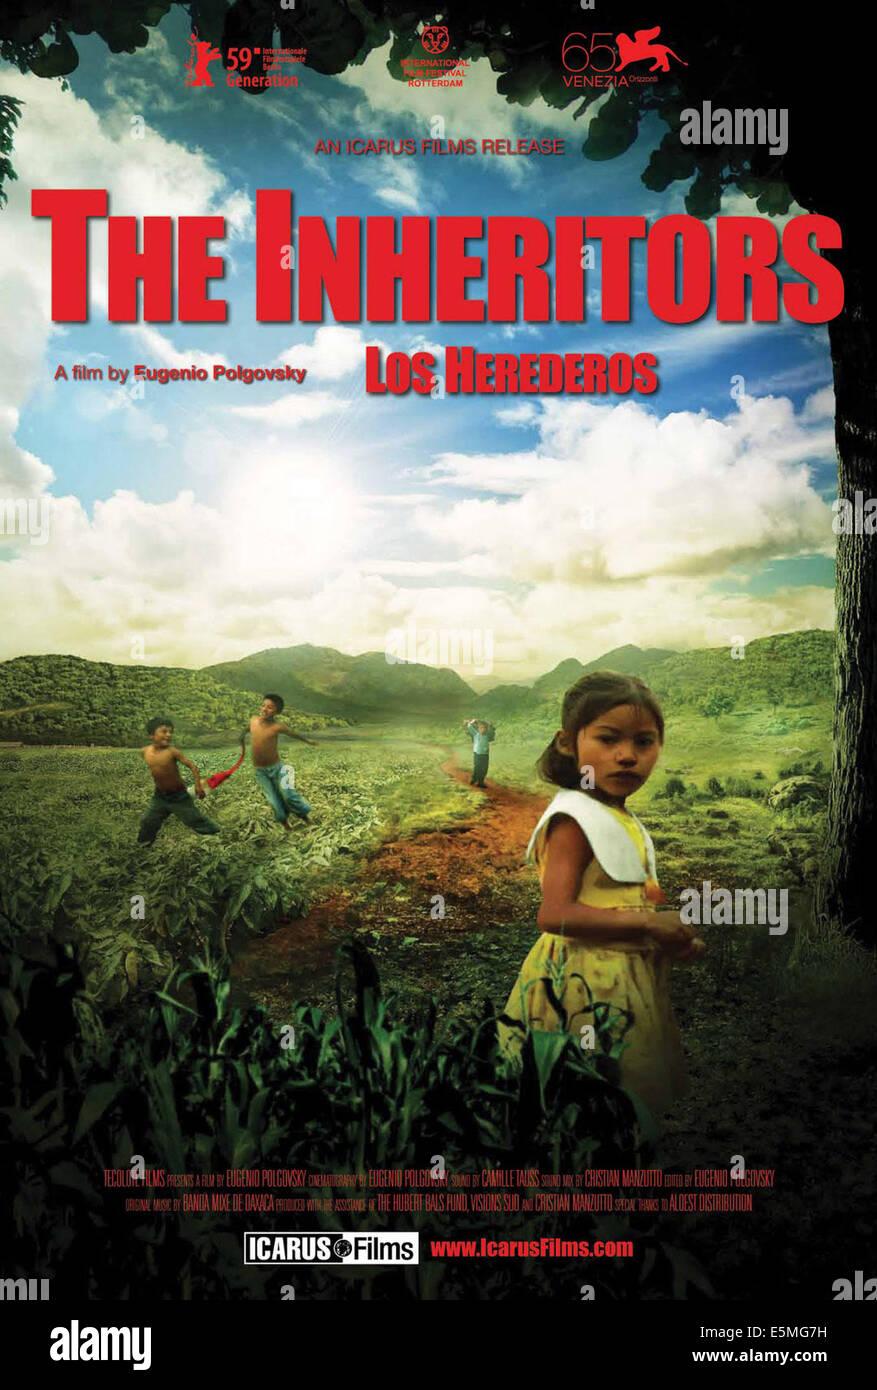 THE INHERITORS, (aka LOS HEREDEROS), US poster art, 2008. - Stock Image